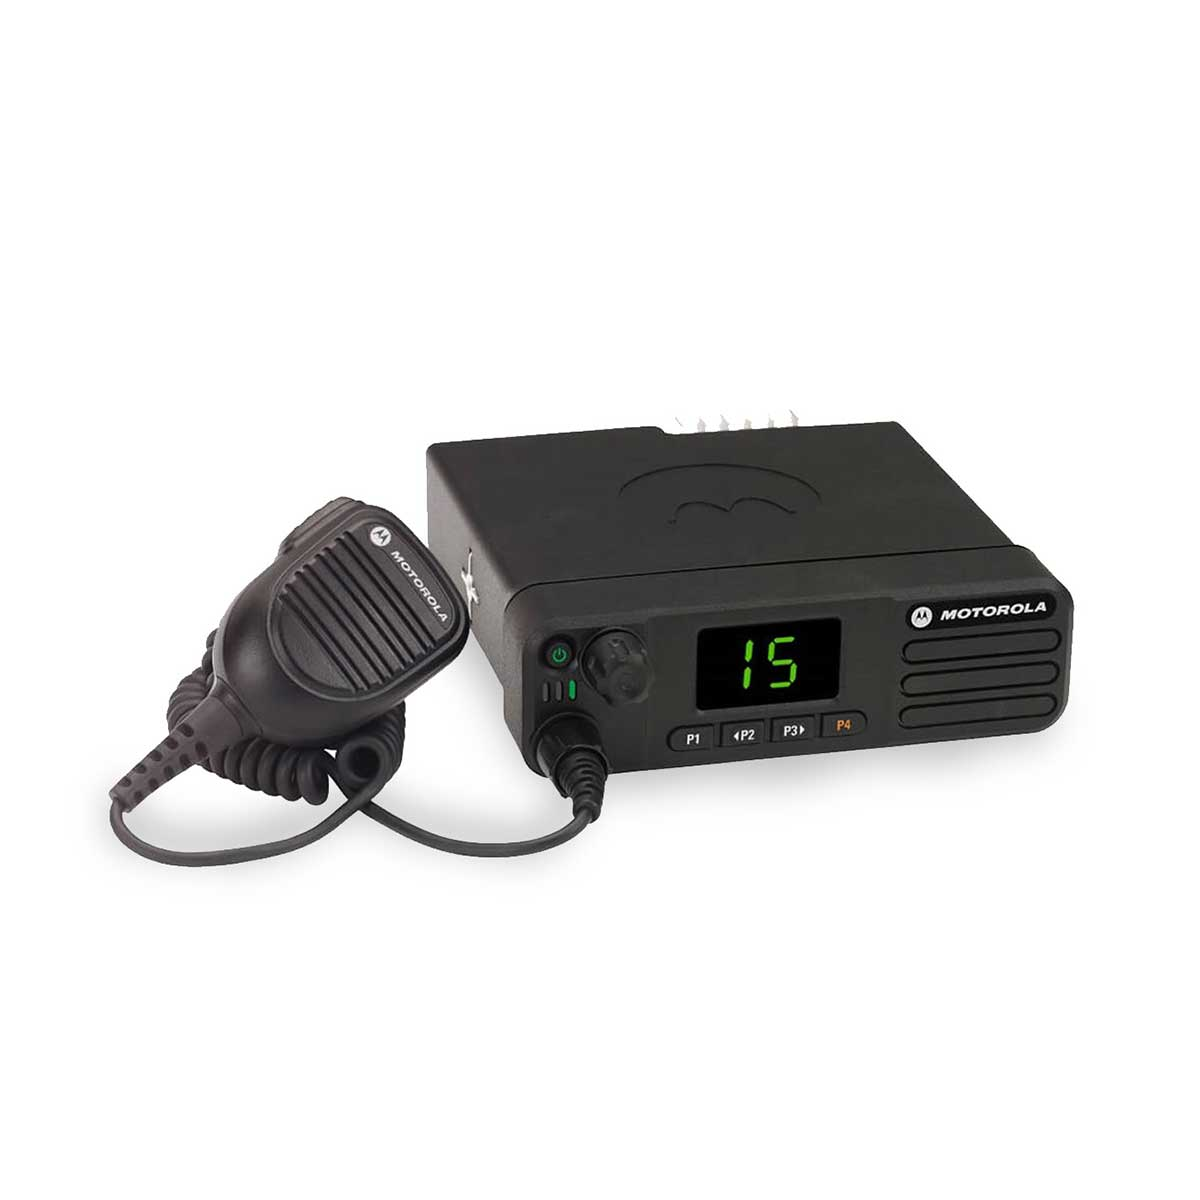 Radio Motorola DGM8000 Digital LAM28TRC9KA1AN UHF 450-527MHZ de 40W